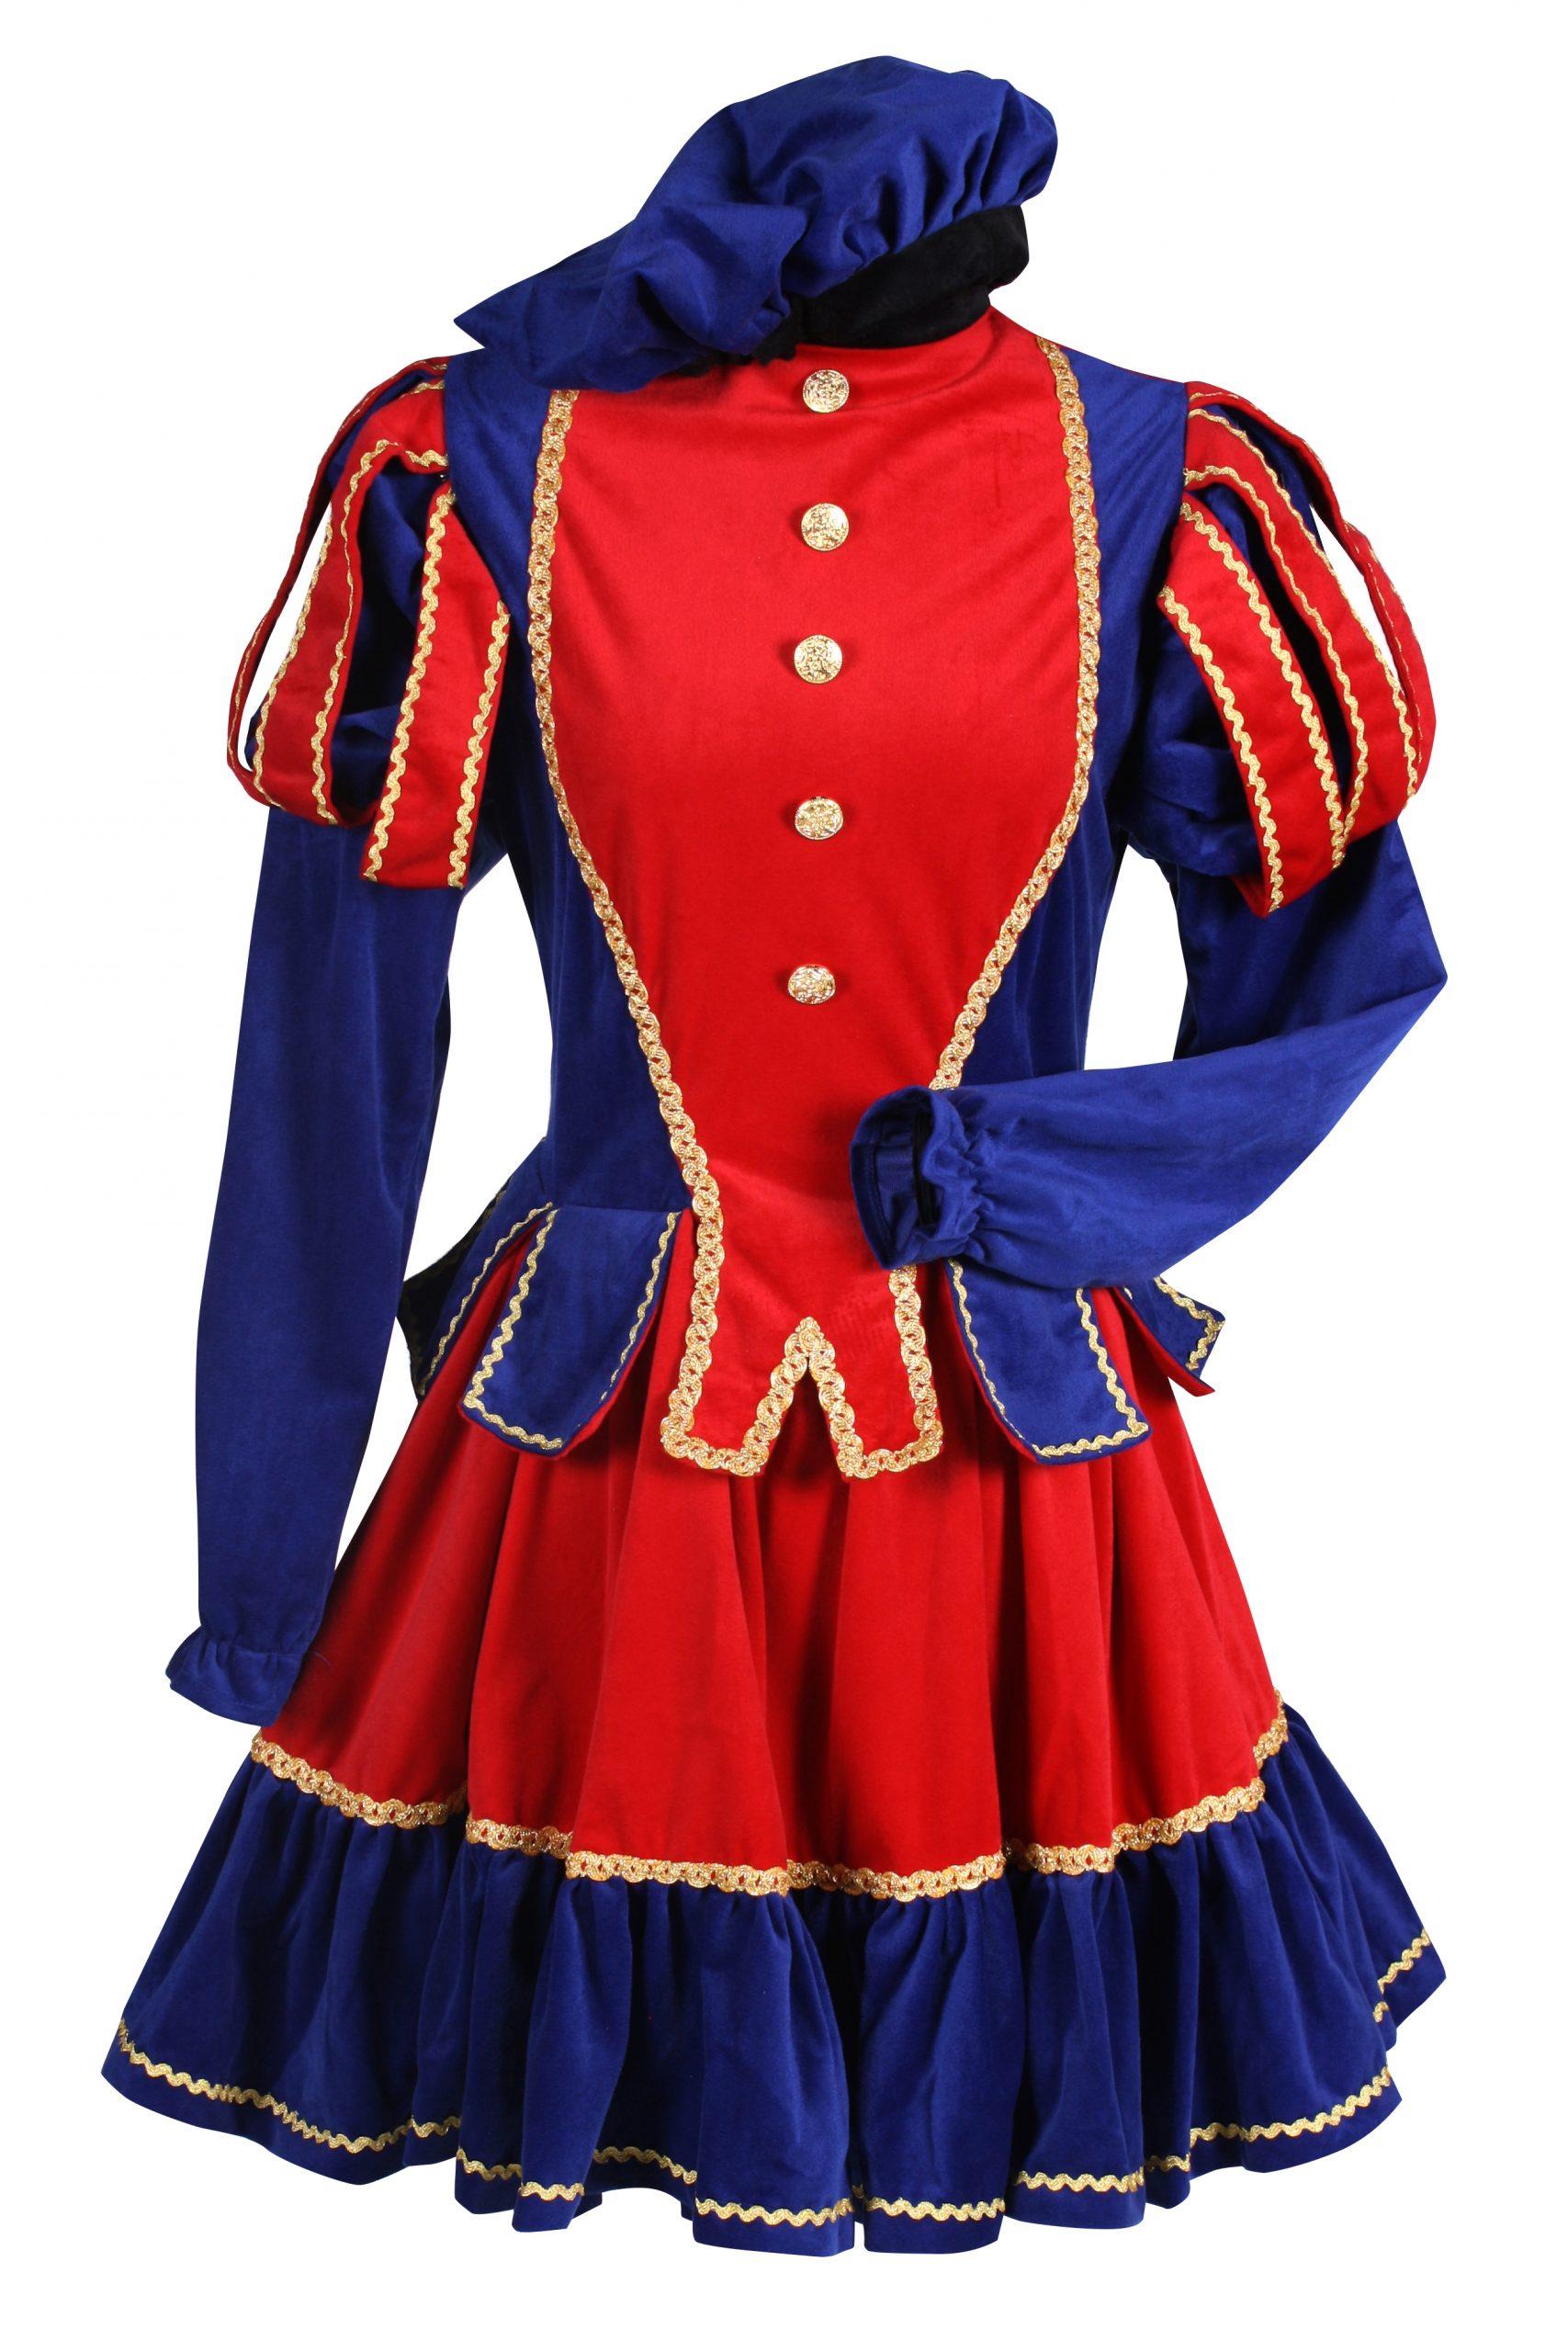 Jurk Damespiet Murcia Blauw/Rood